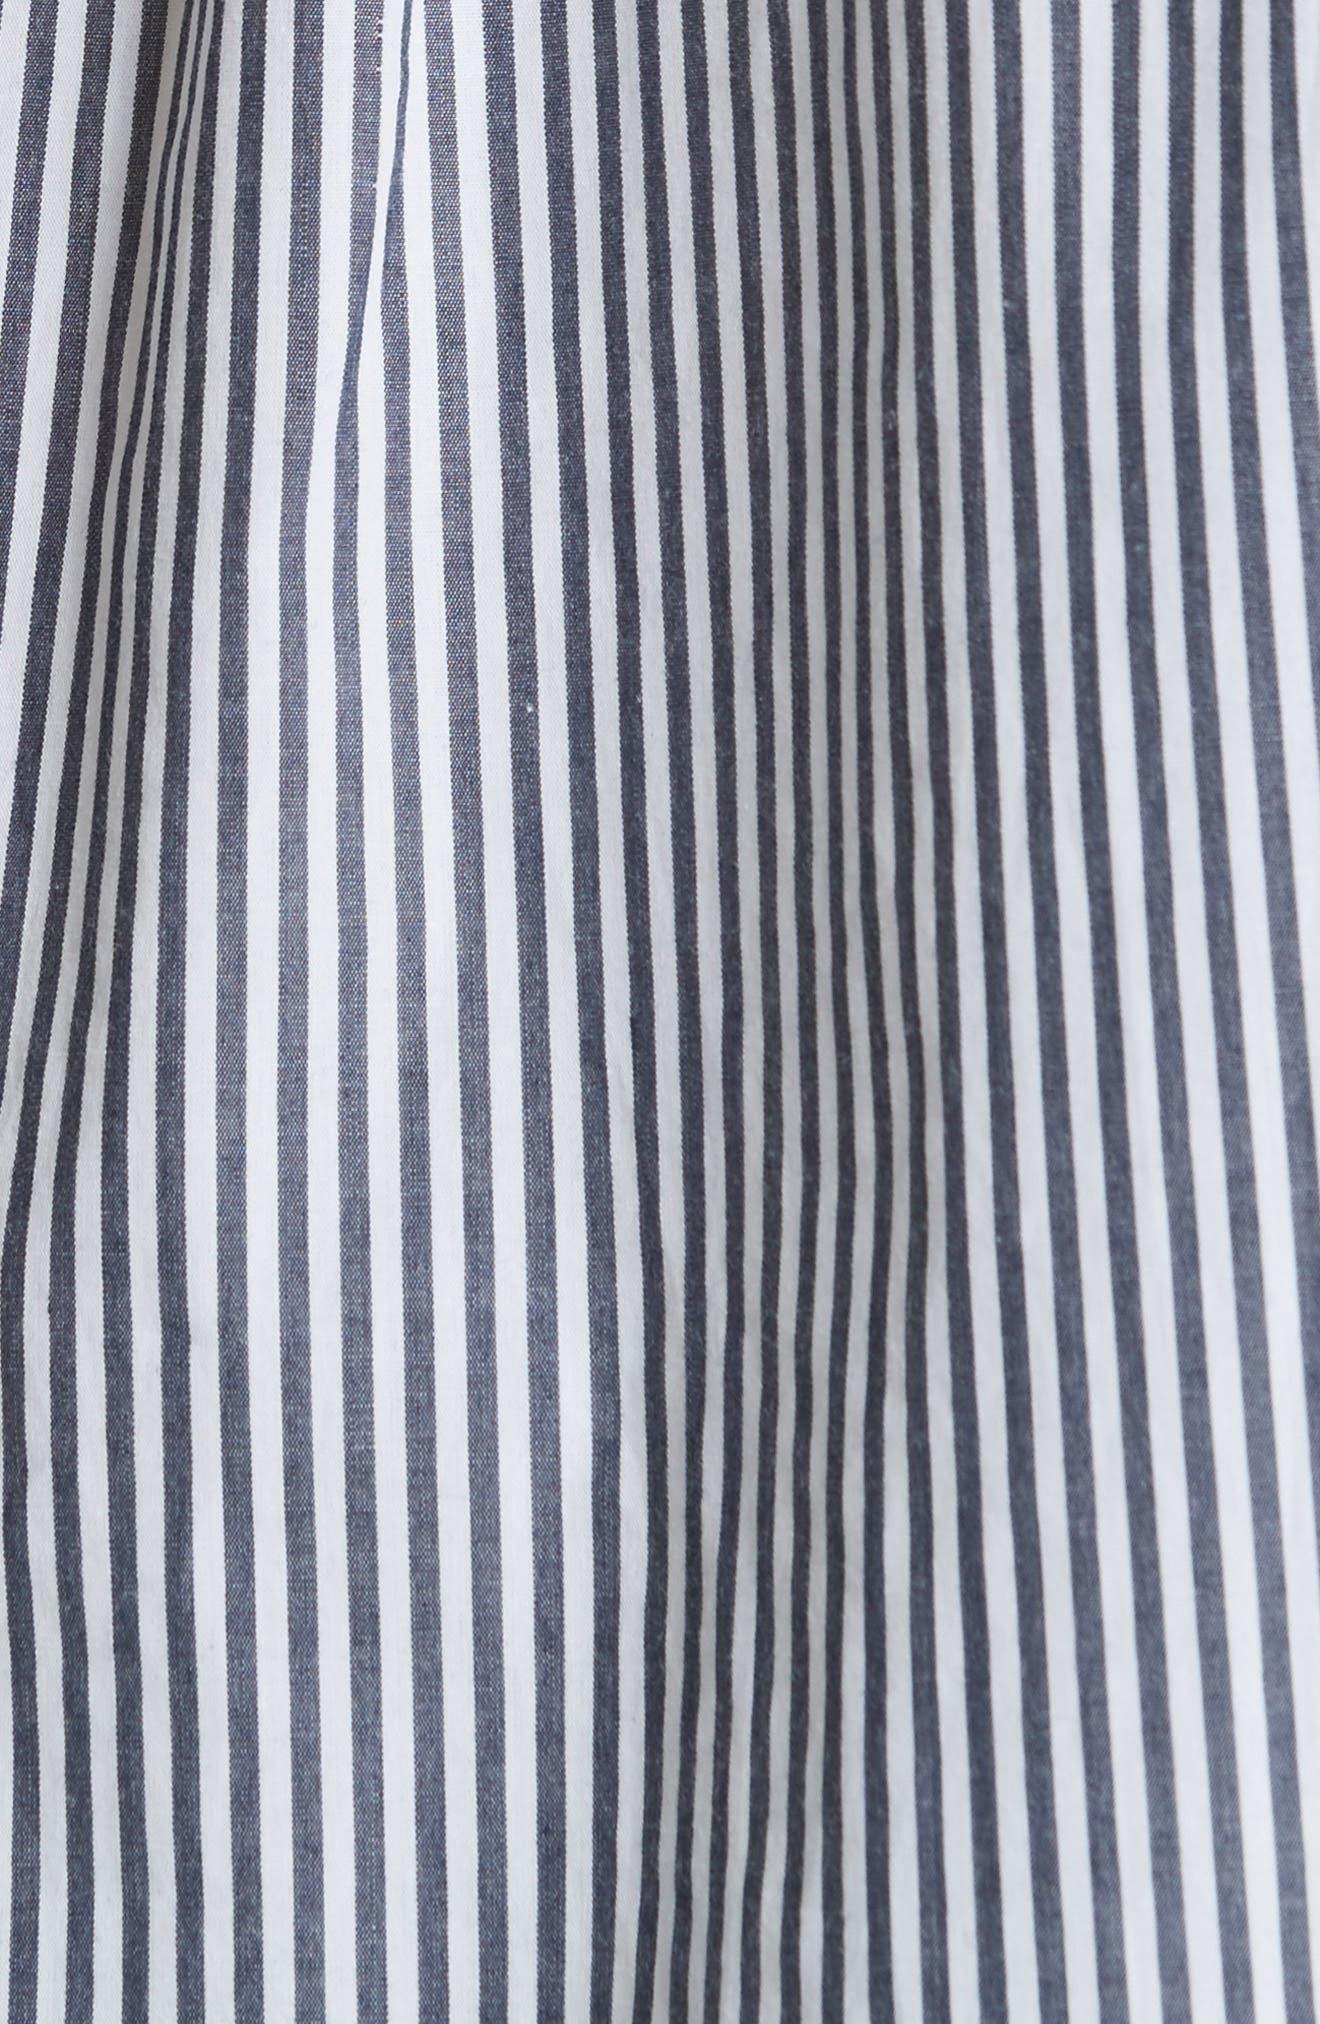 Anjanique Spread Collar Top,                             Alternate thumbnail 5, color,                             418